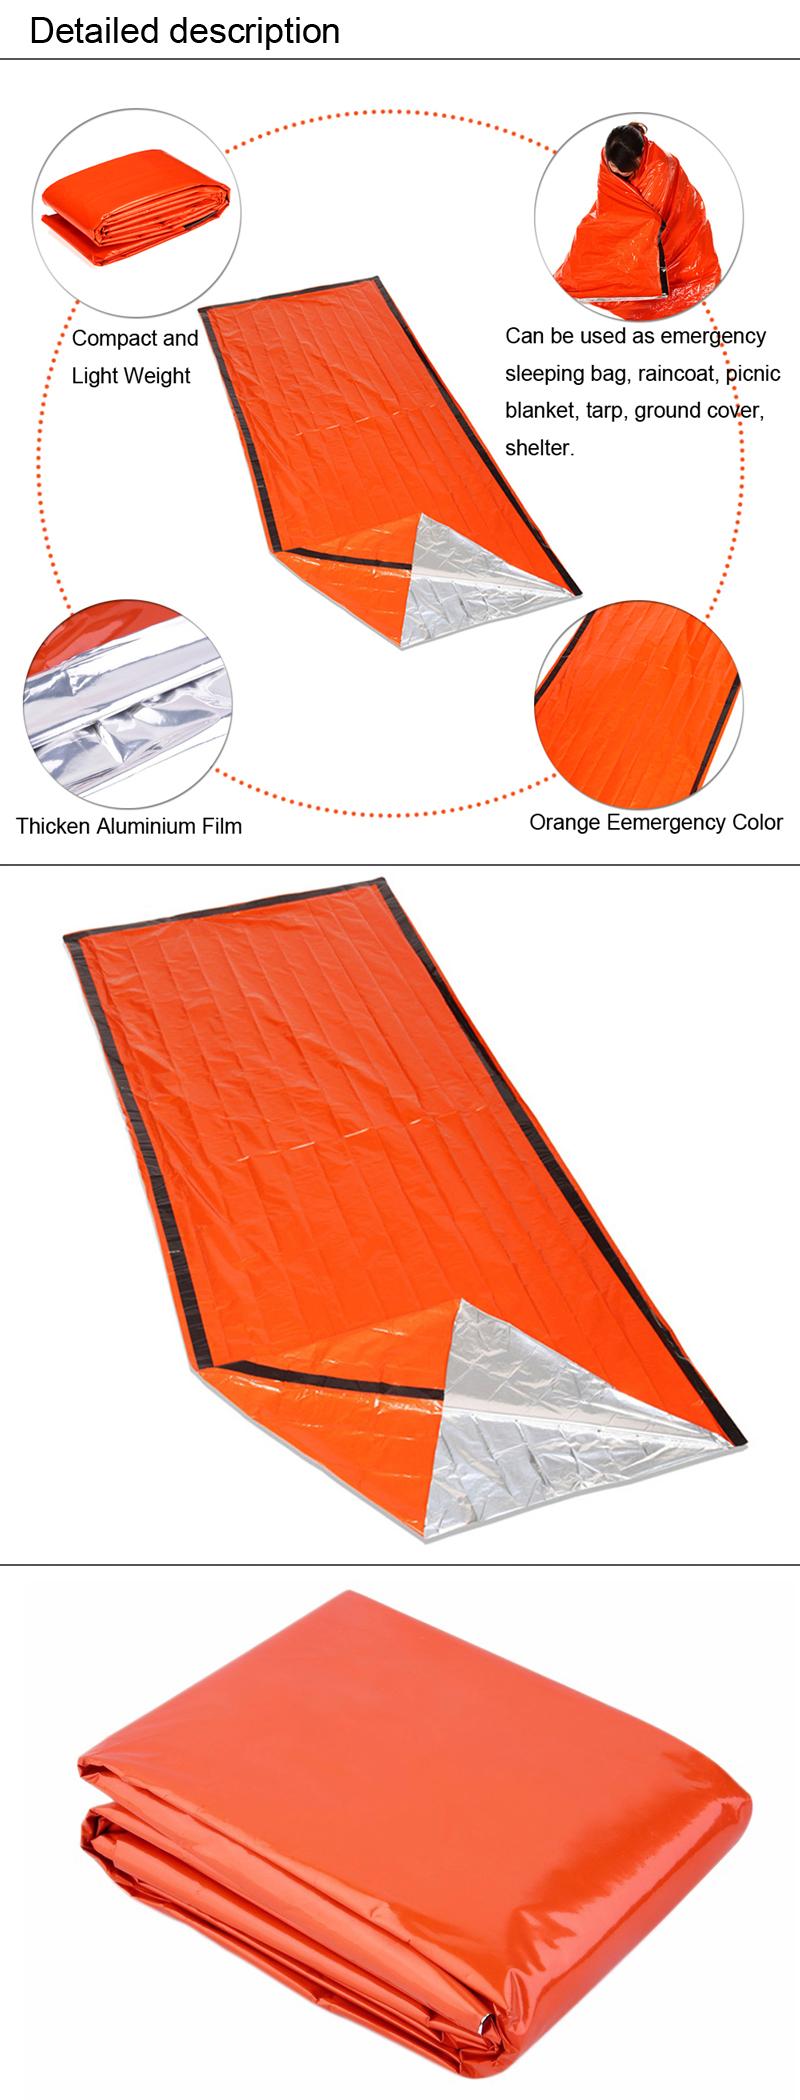 Emergency Sleeping Bag Orange Thermal Reflective Survival Blanket  Ultralight Outdoor Body Heat Retention Emergency Tool